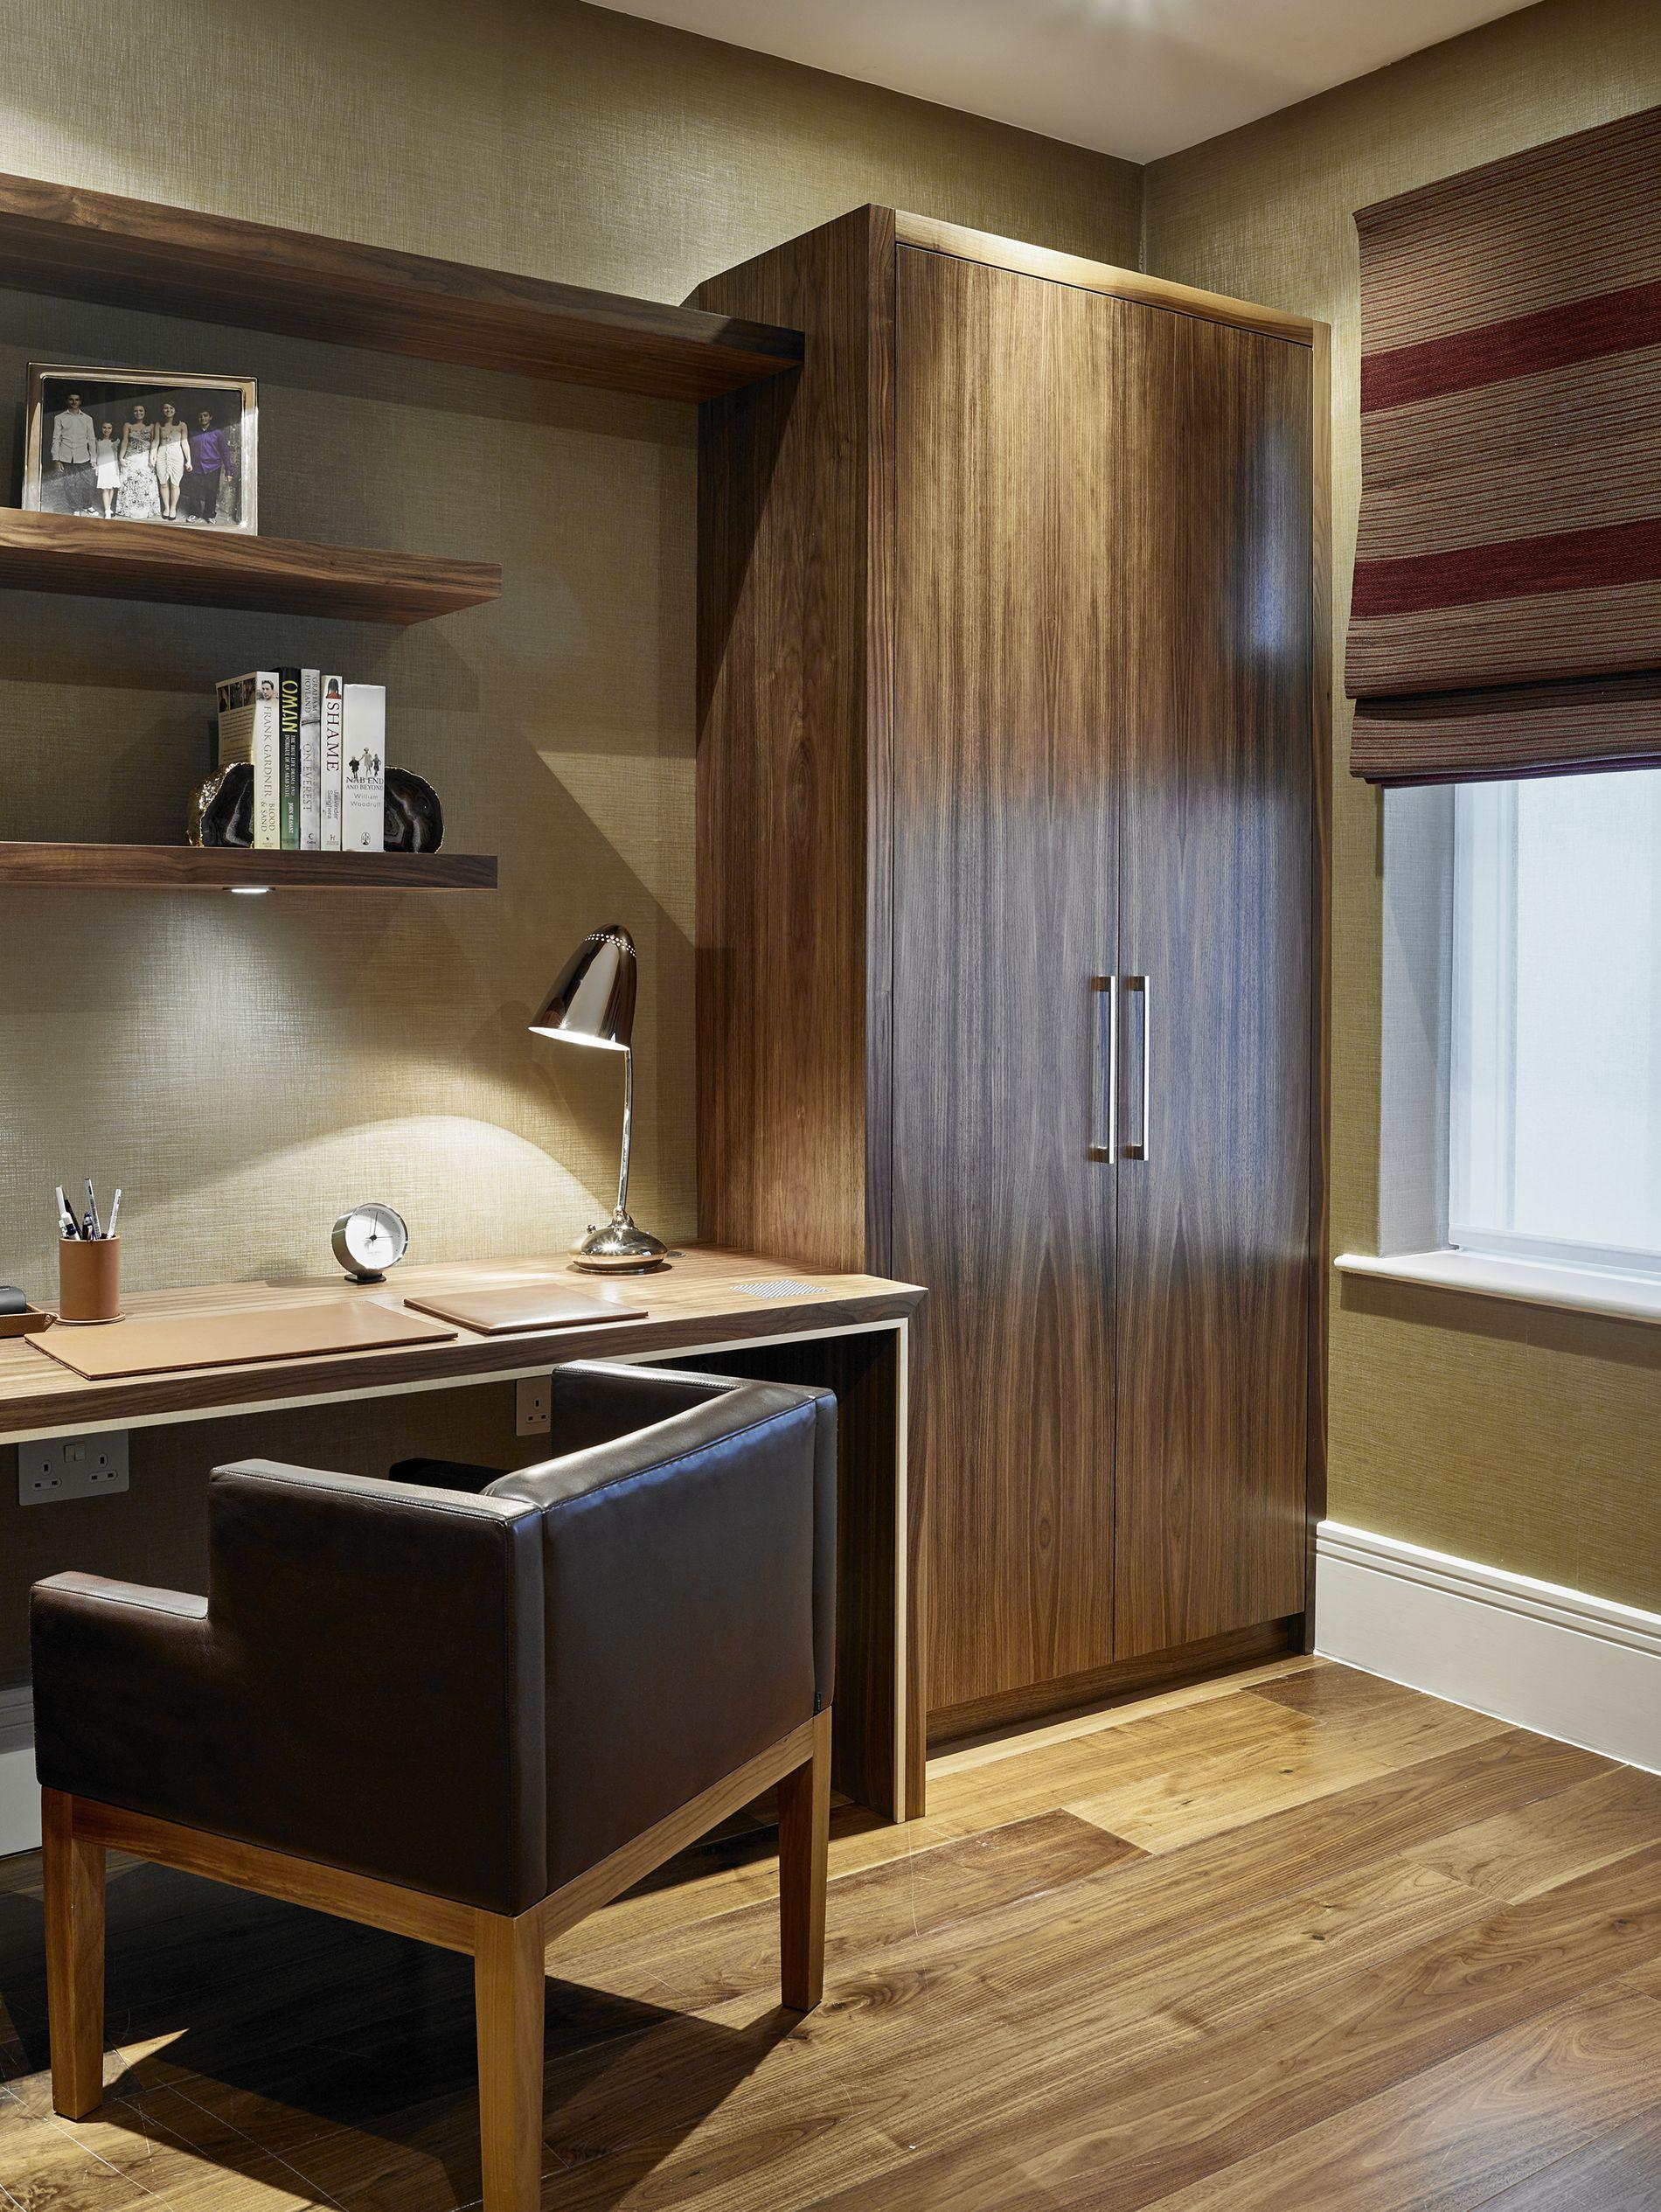 Bespoke Home Office Furniture. Midcentury Modern Desk, Shelves And Wardrobe  For Study In Merton, South West London